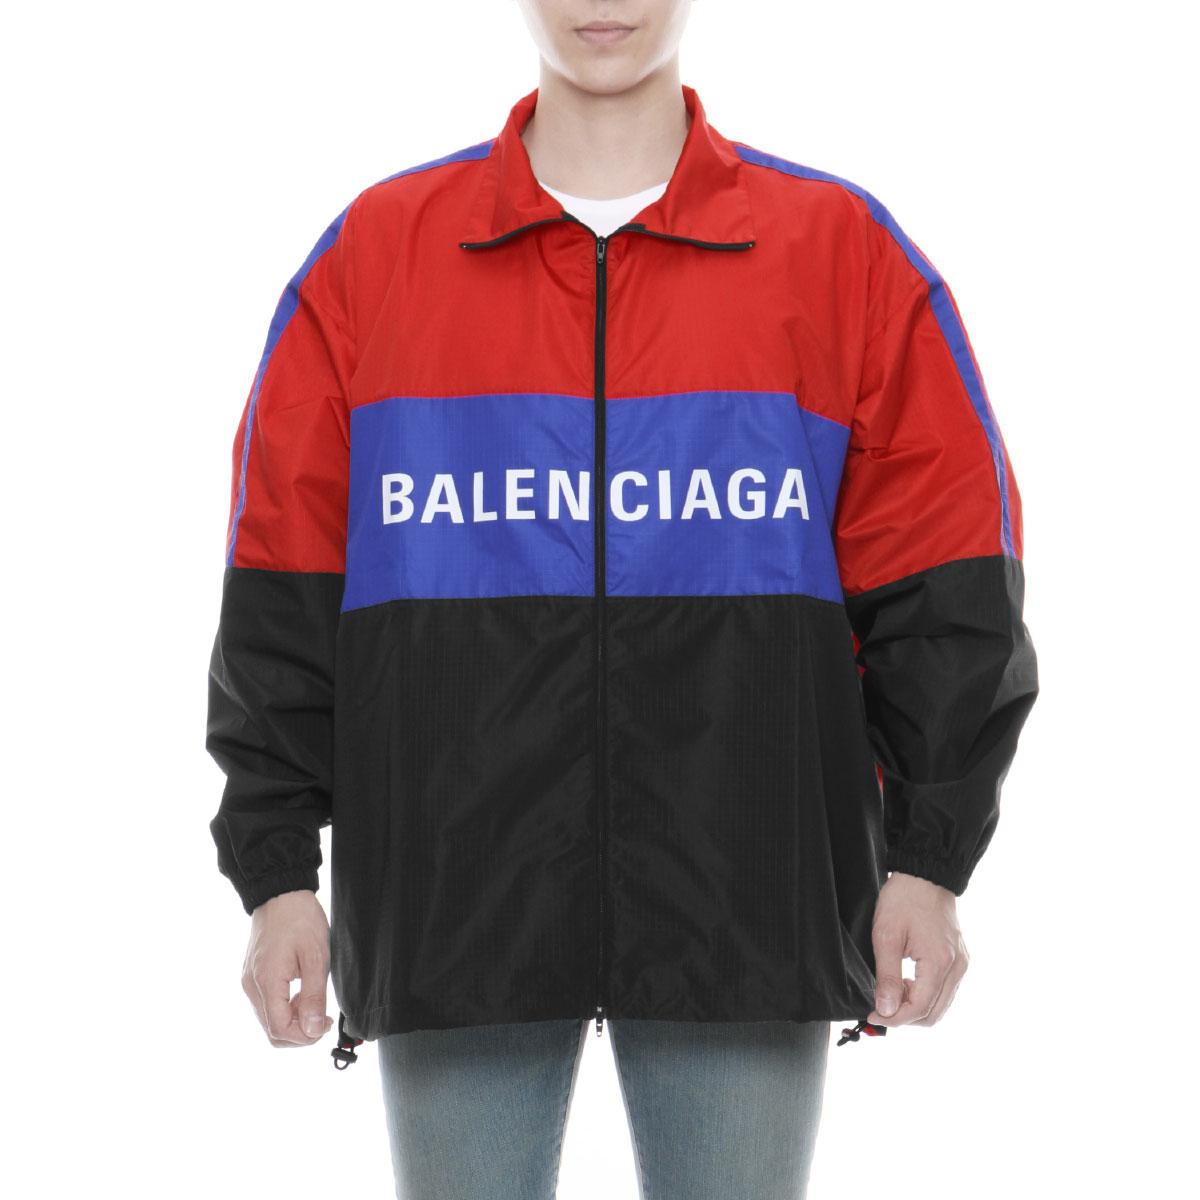 les ventes chaudes 70025 8a6bc 534317 バレンシアガ BALENCIAGA outer men TYD33 6210 jacket ROUGE/NOIR multicolored